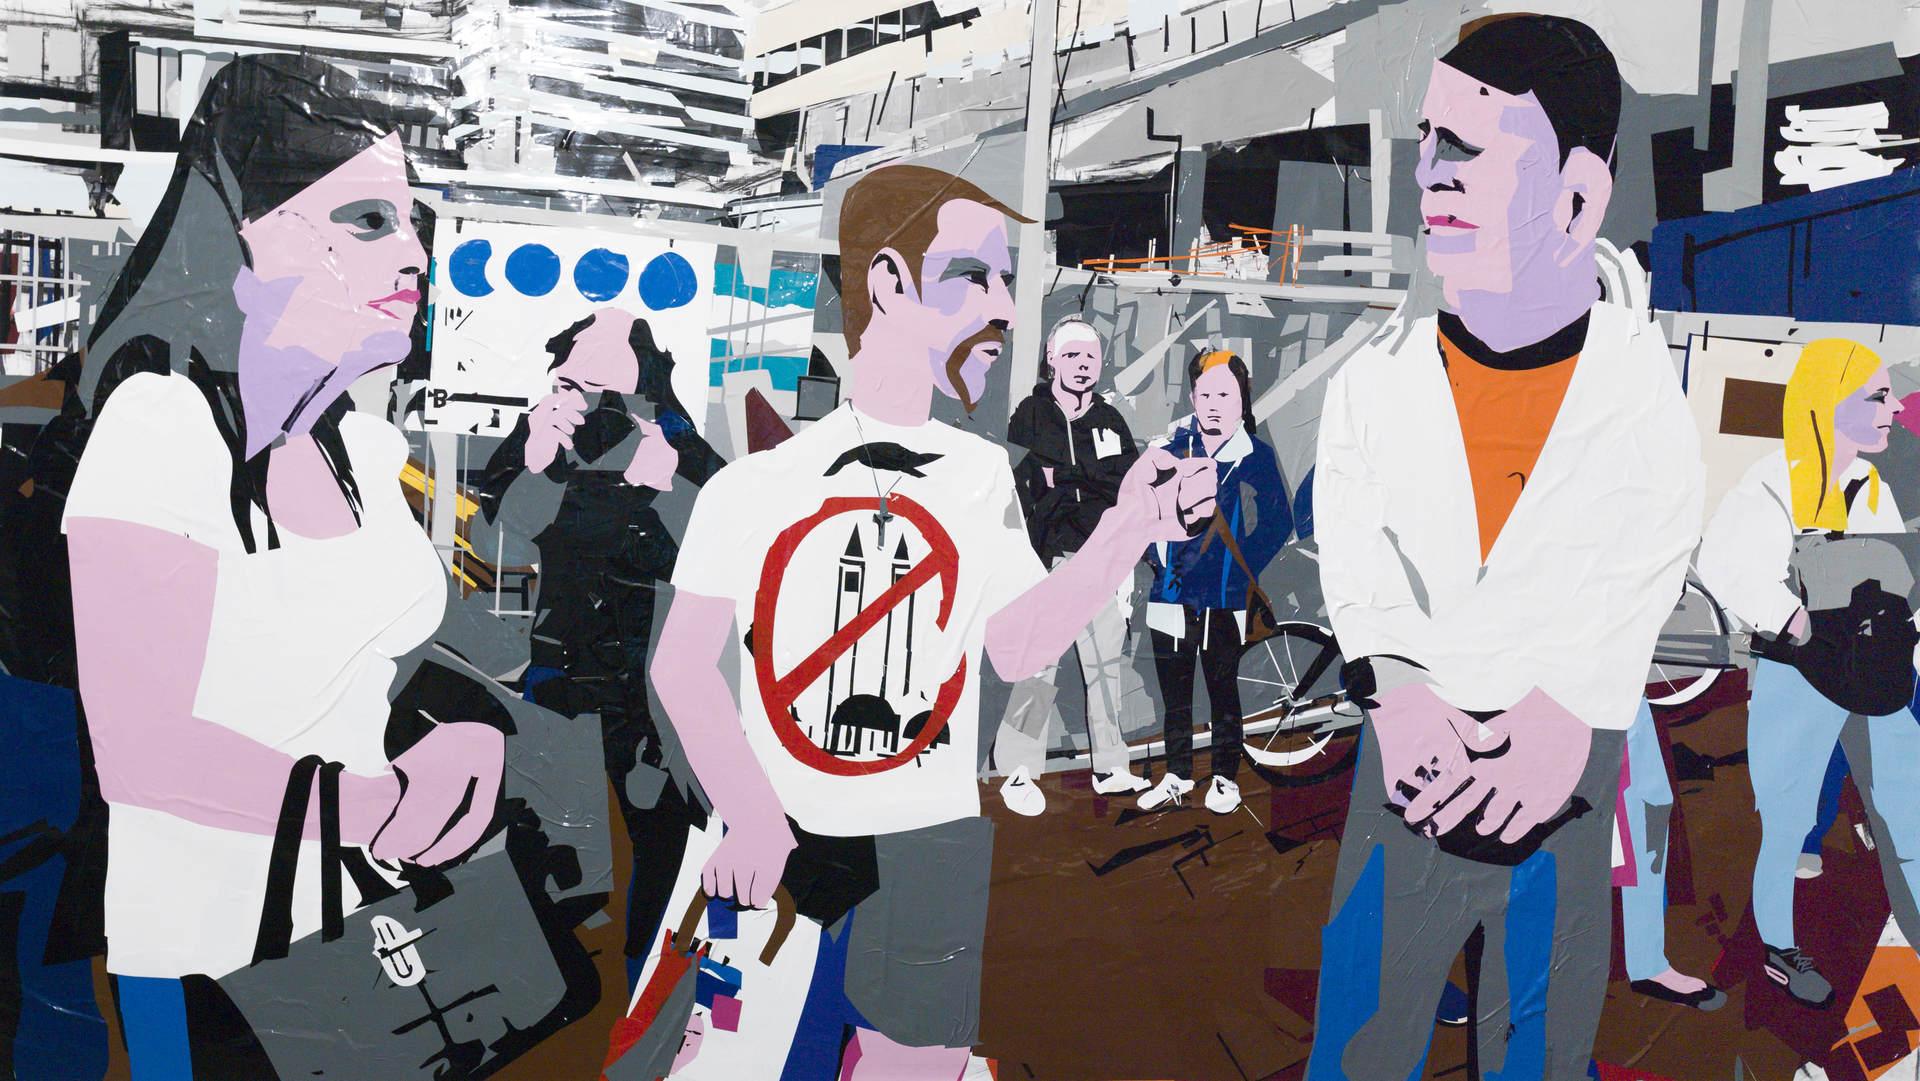 Erik van Lieshout_Untitled_Galerie Guido W. Baudach_P 80